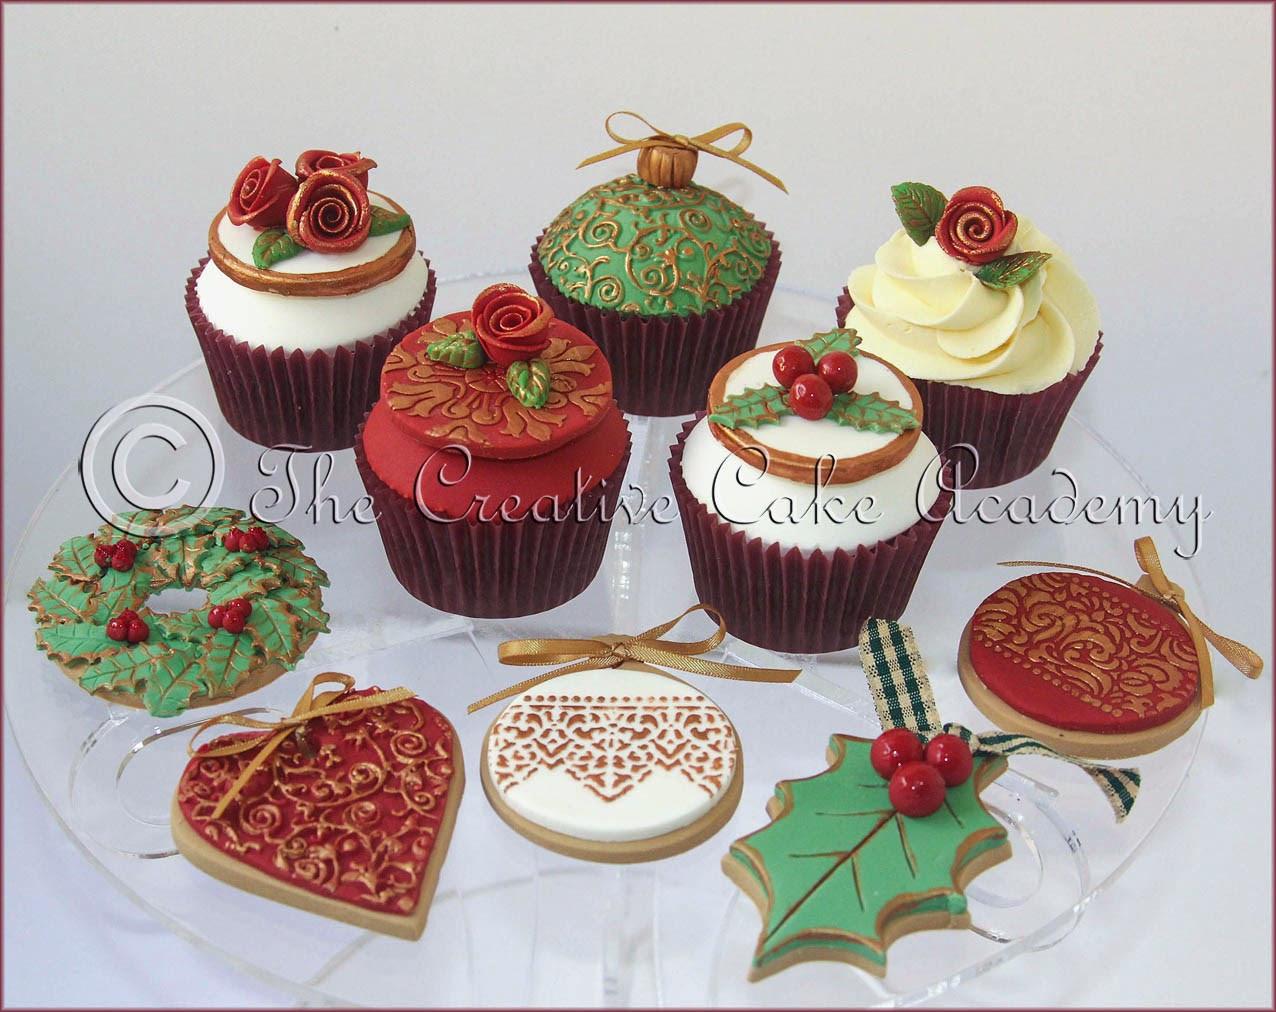 Christmas Cake And Cupcakes  The Creative Cake Academy